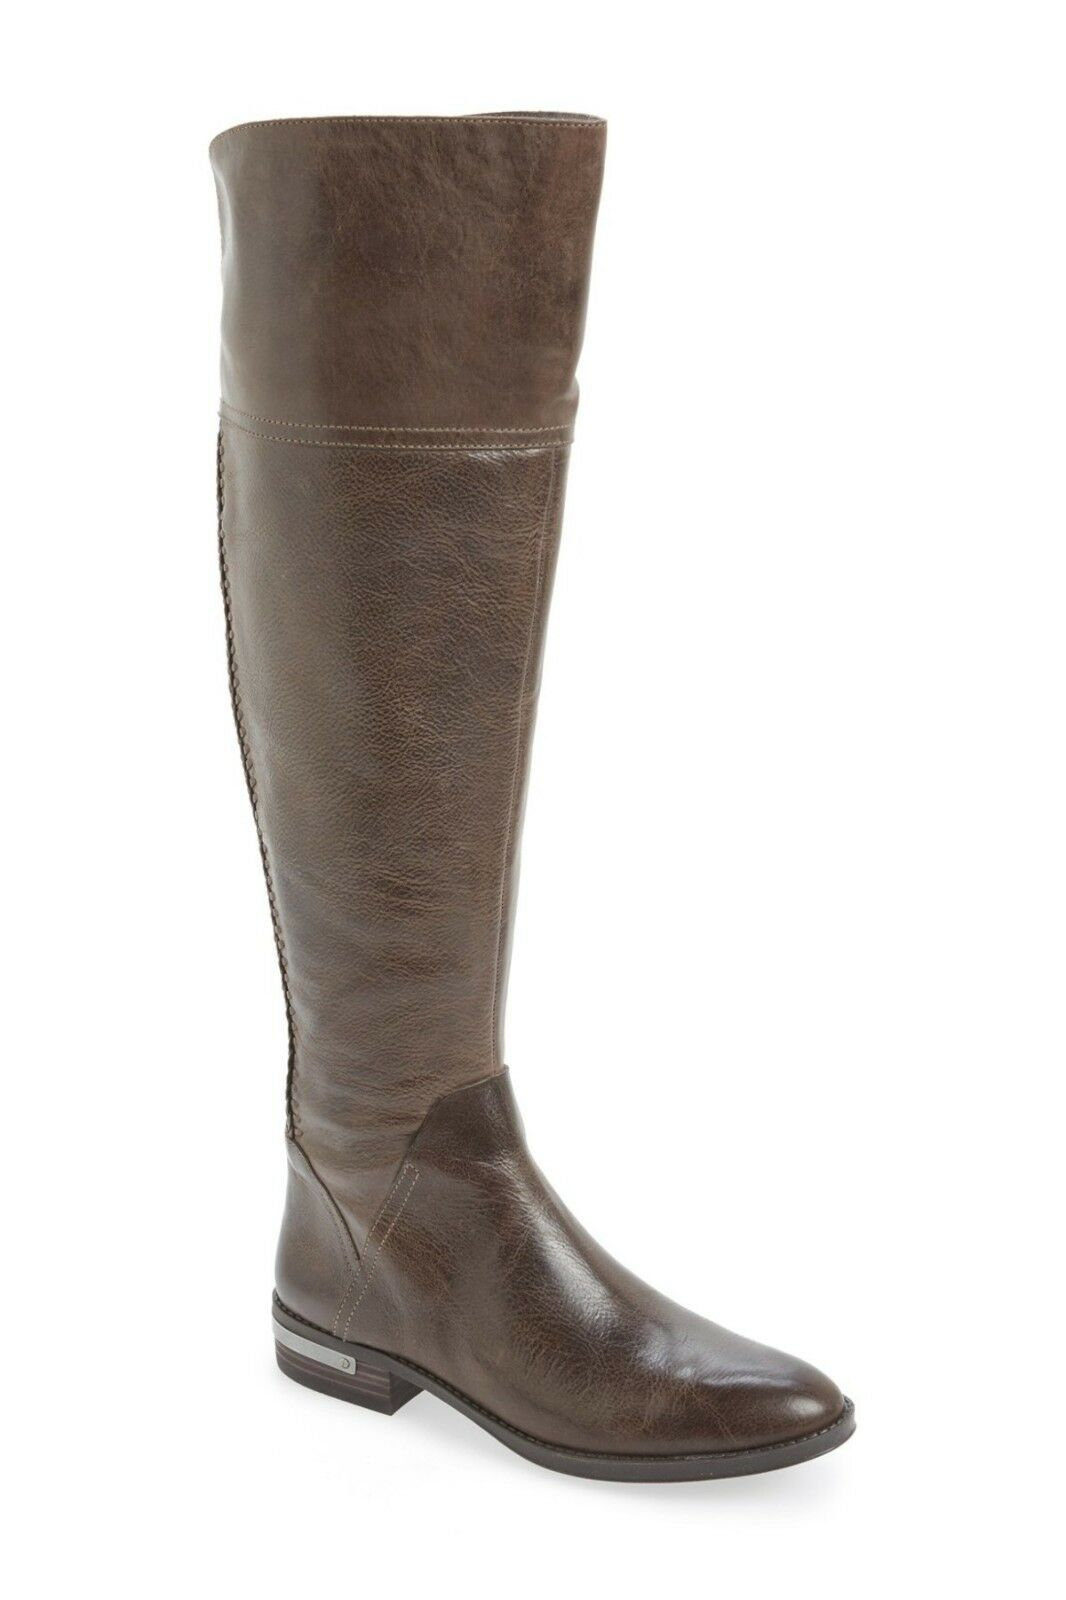 NEU Vince Camuto Pedra Over-the-Knee Boot Grau Distressed Leder, Größe 6.5 229